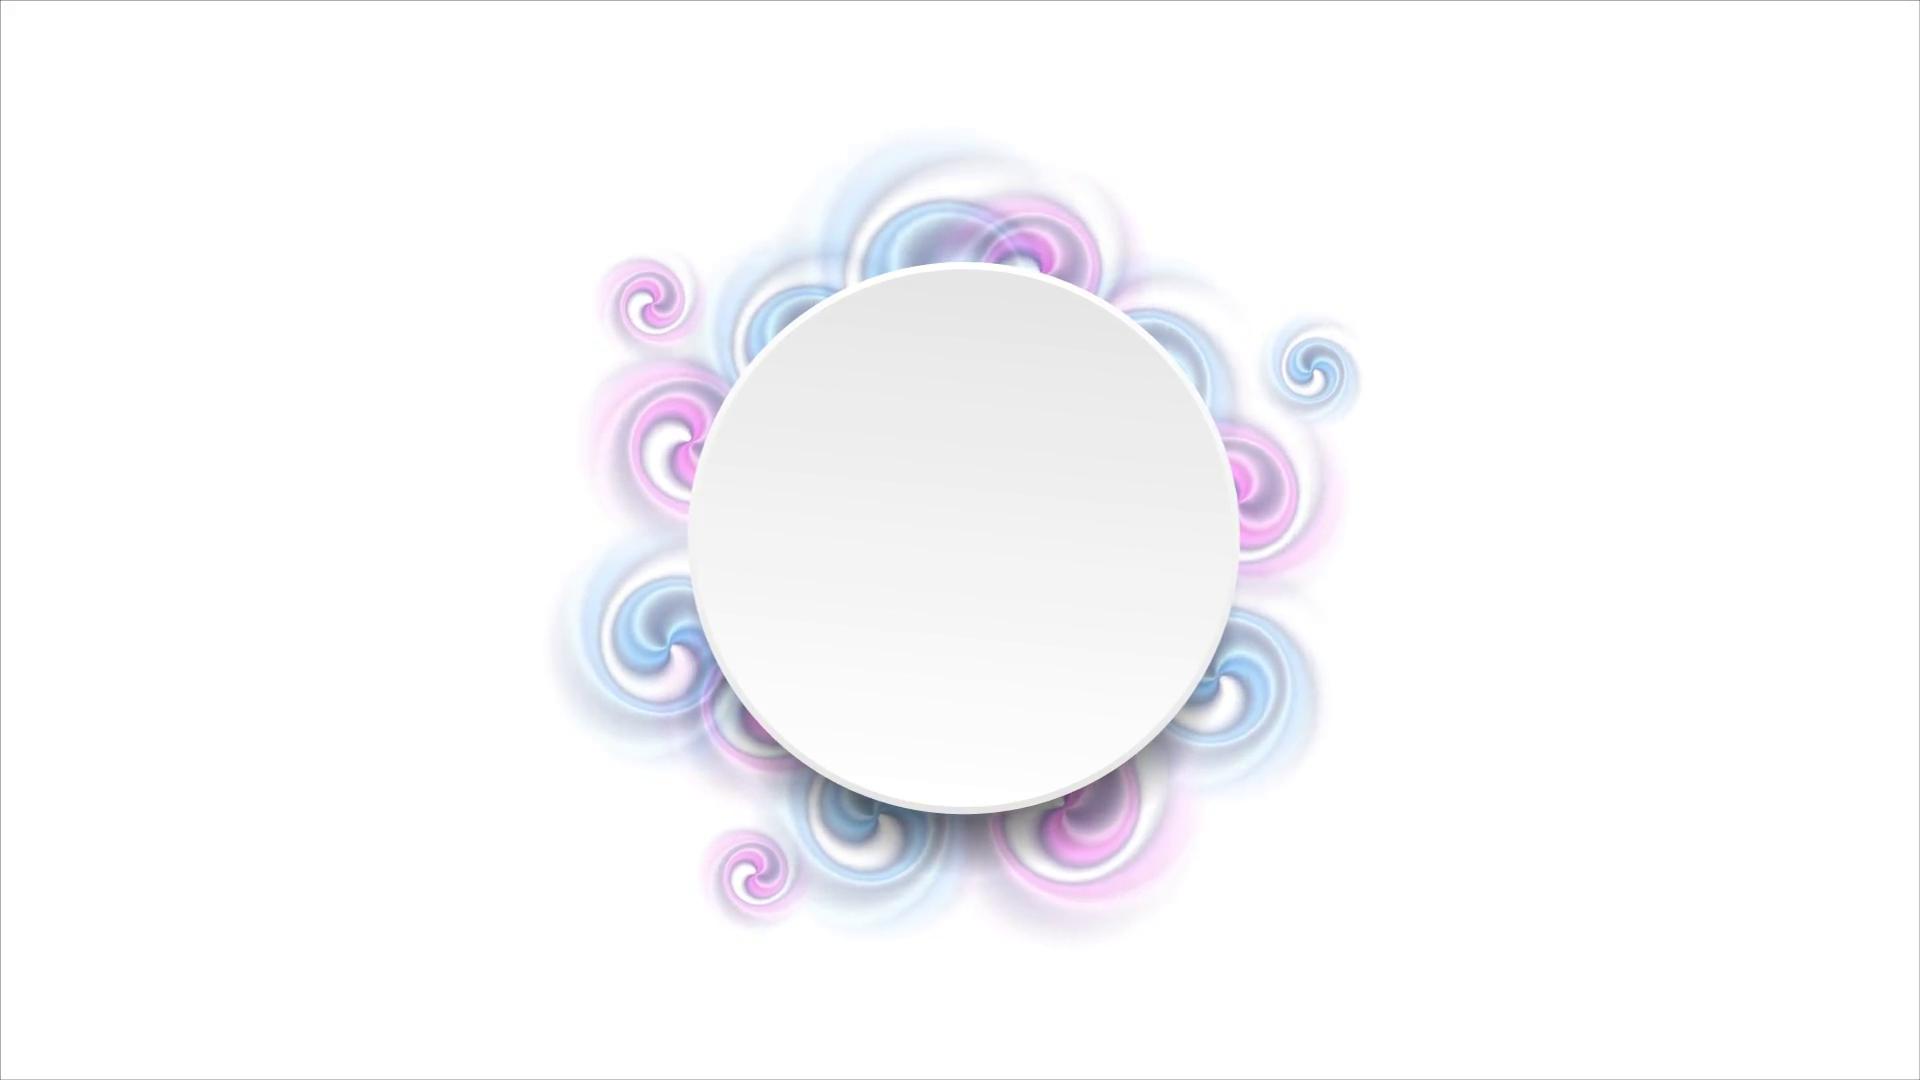 Circle Shape PNG HD - 142116